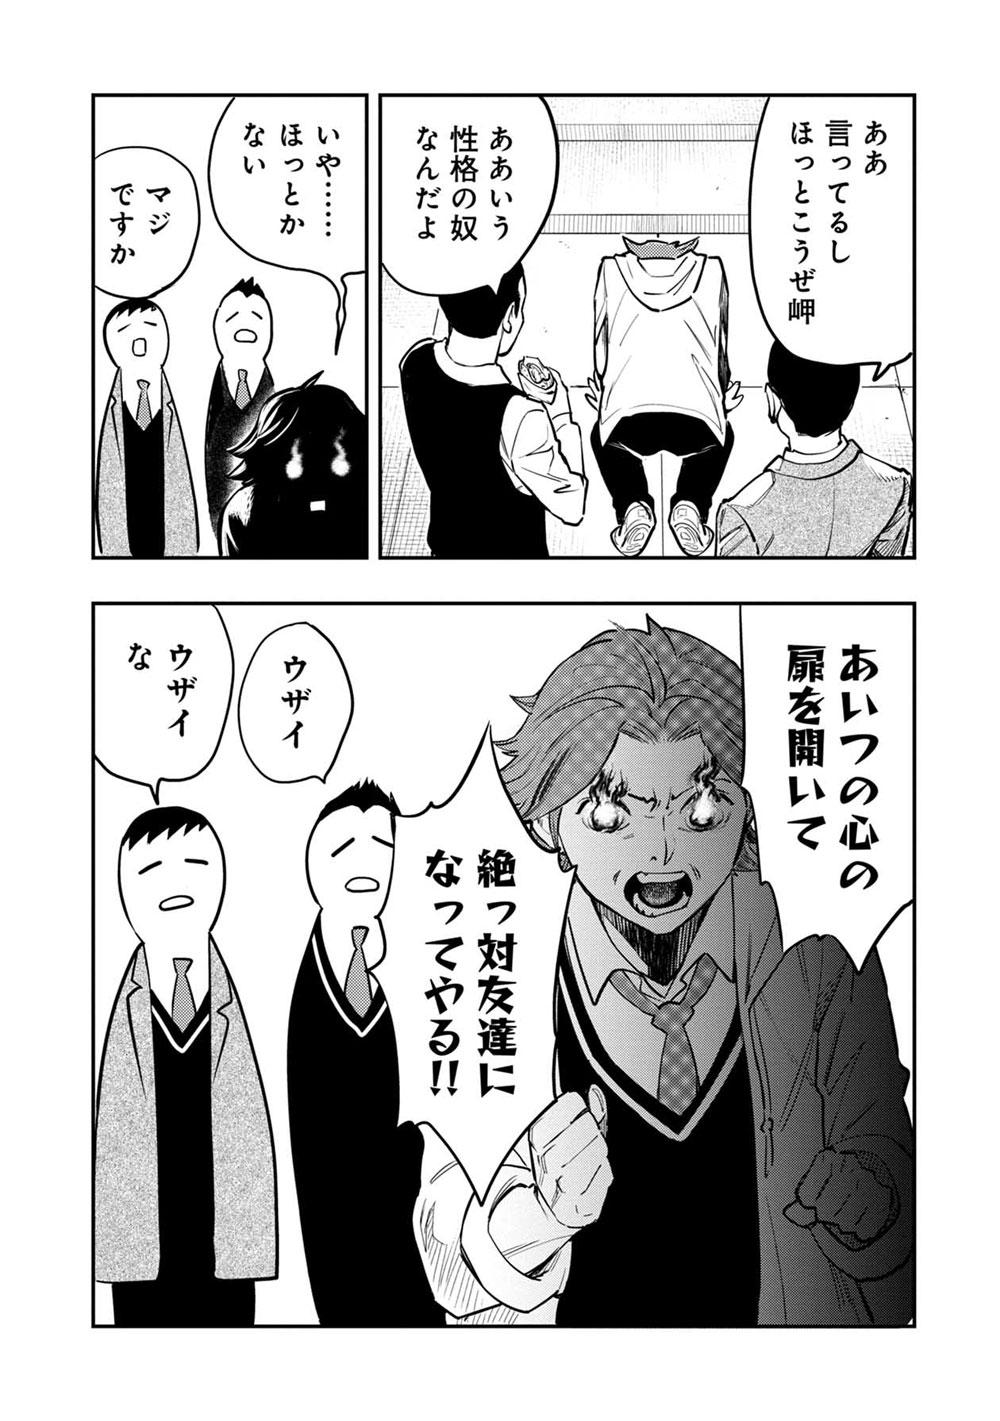 inugami_re_001_029.jpg